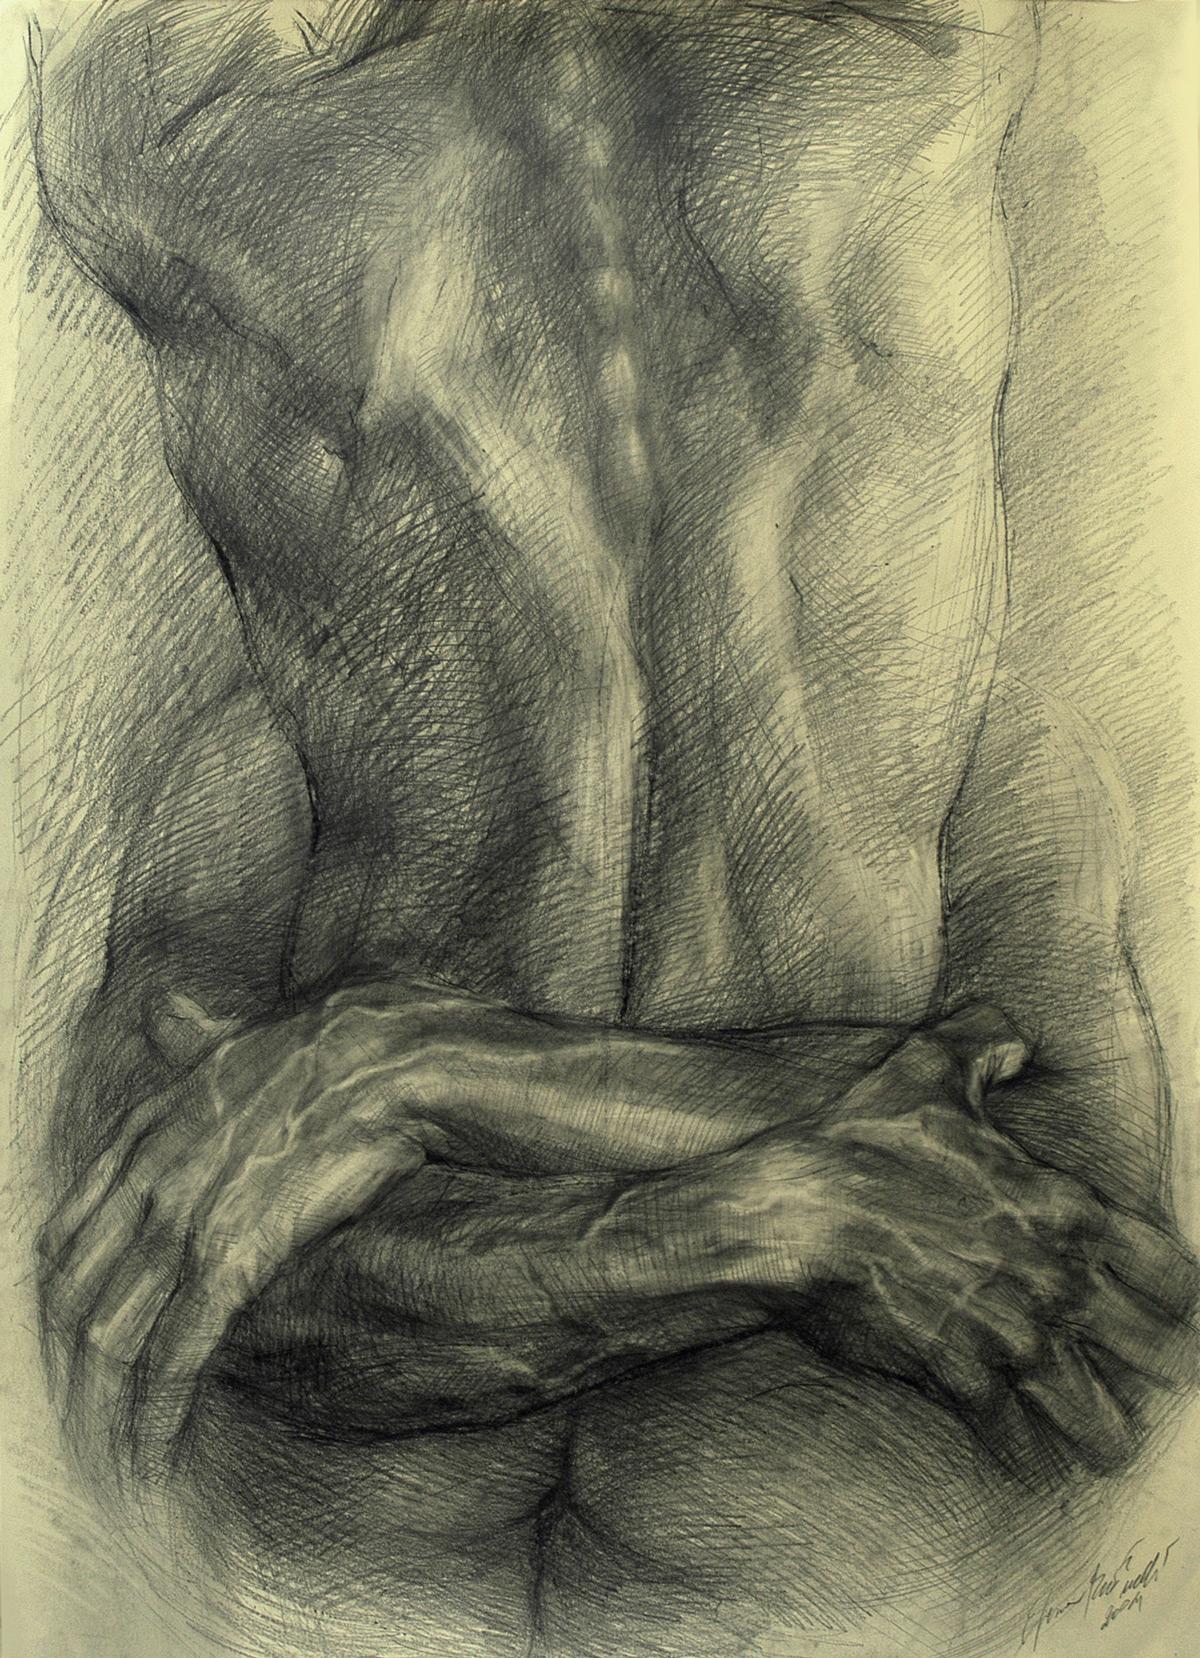 Elena-Mutinelli-29-etra-studio-tommasi